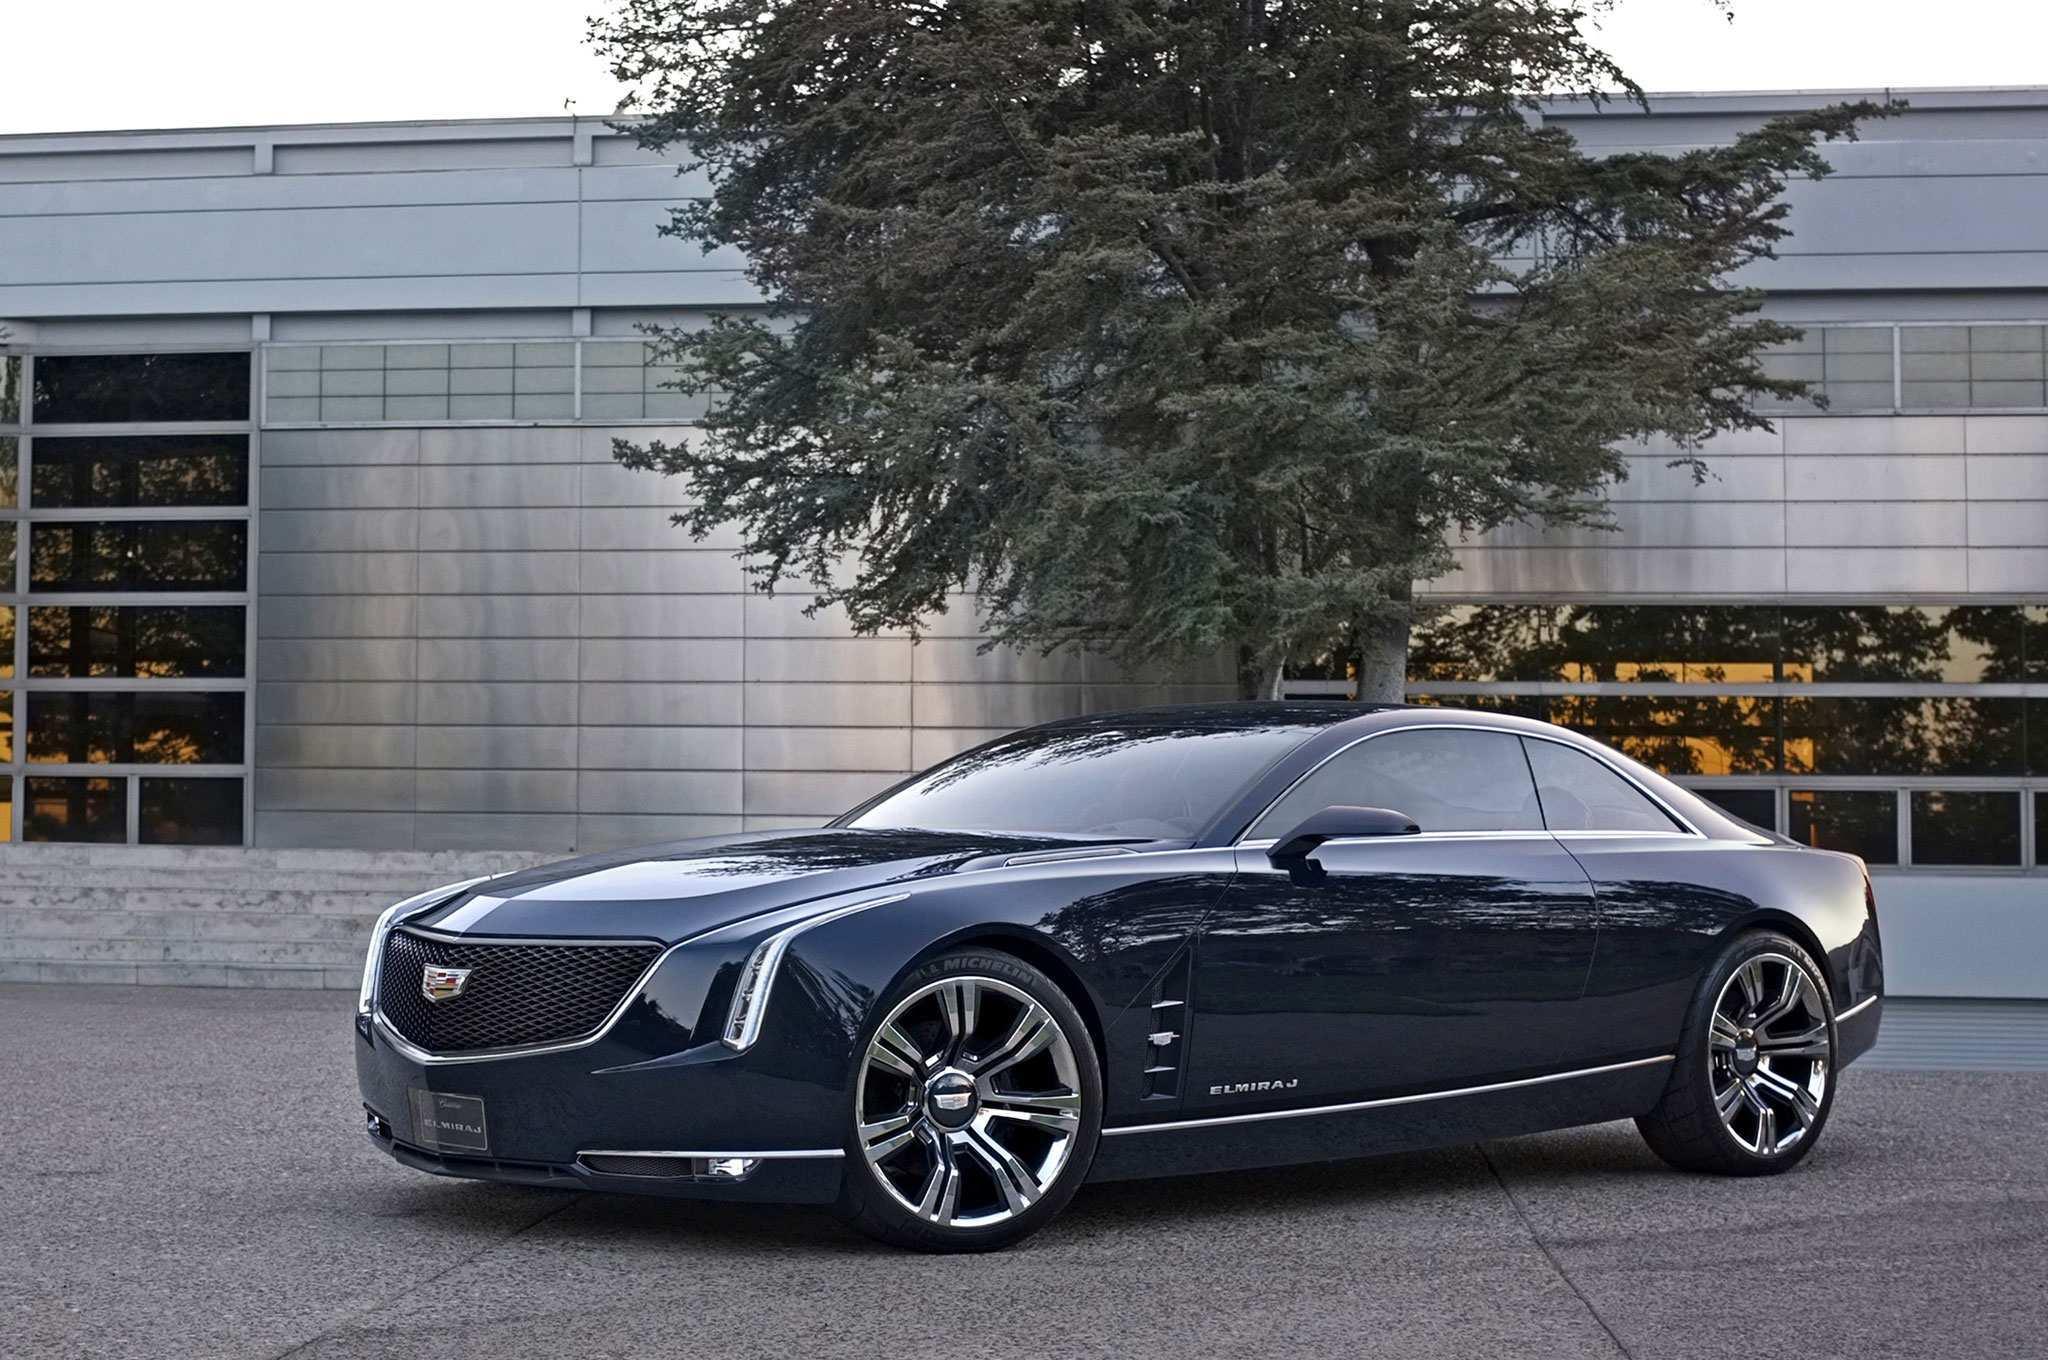 57 New 2020 Cadillac Elmiraj Redesign and Concept by 2020 Cadillac Elmiraj